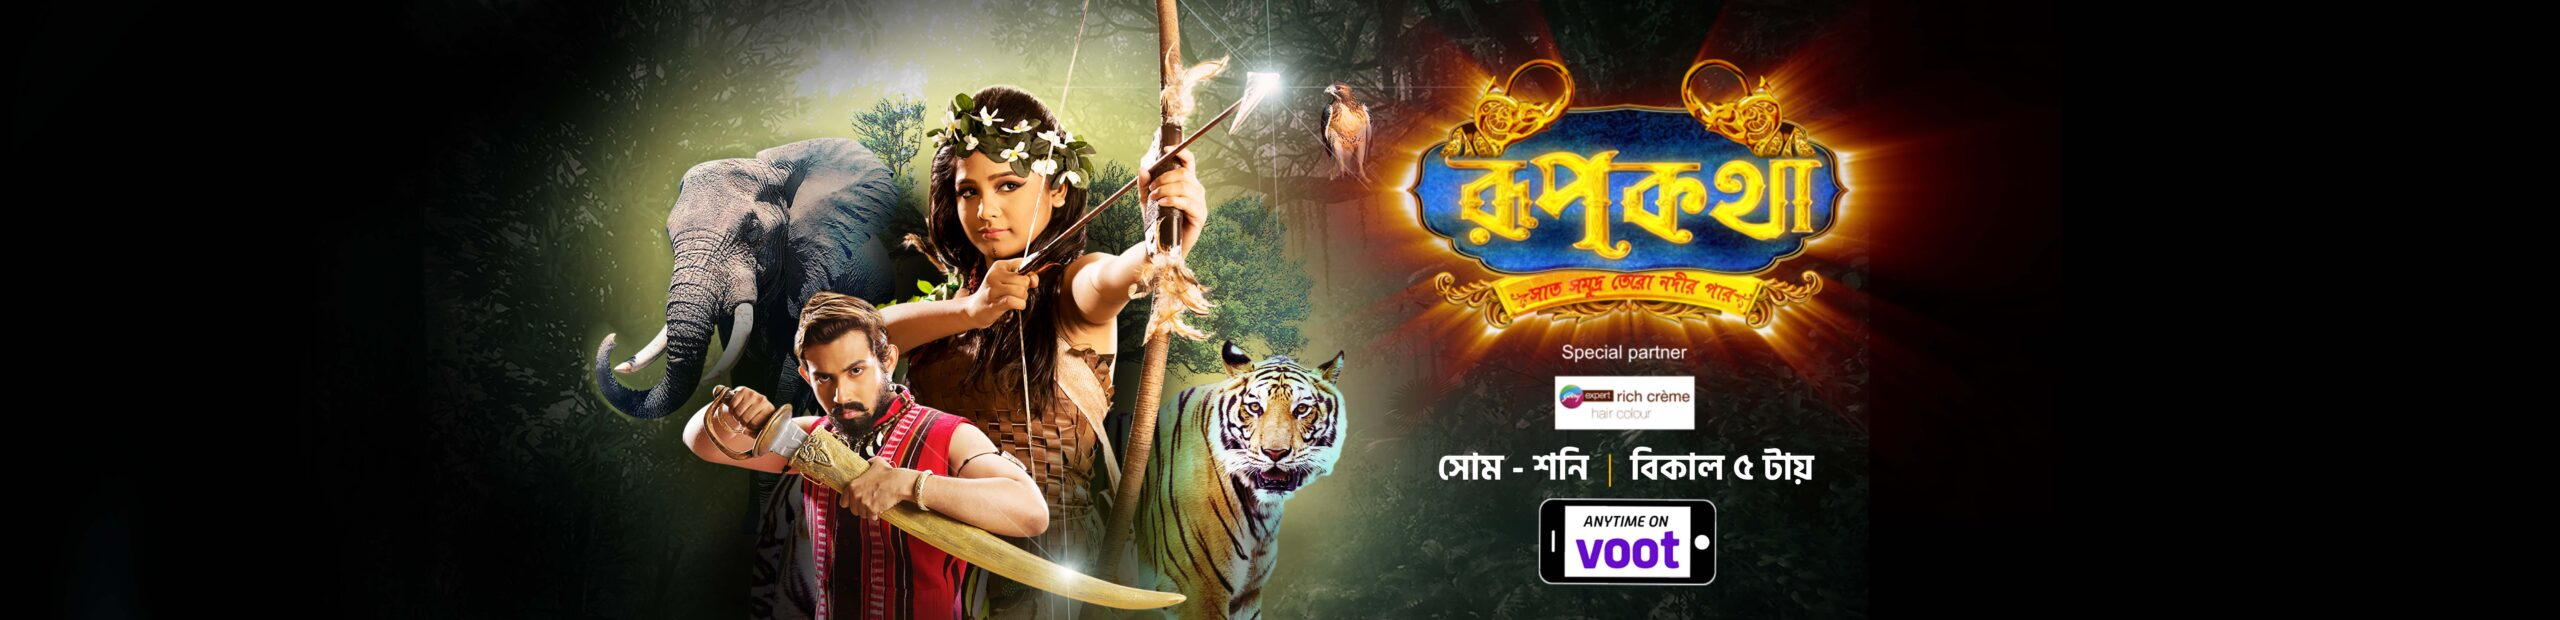 Rupkatha Banner 1 copy